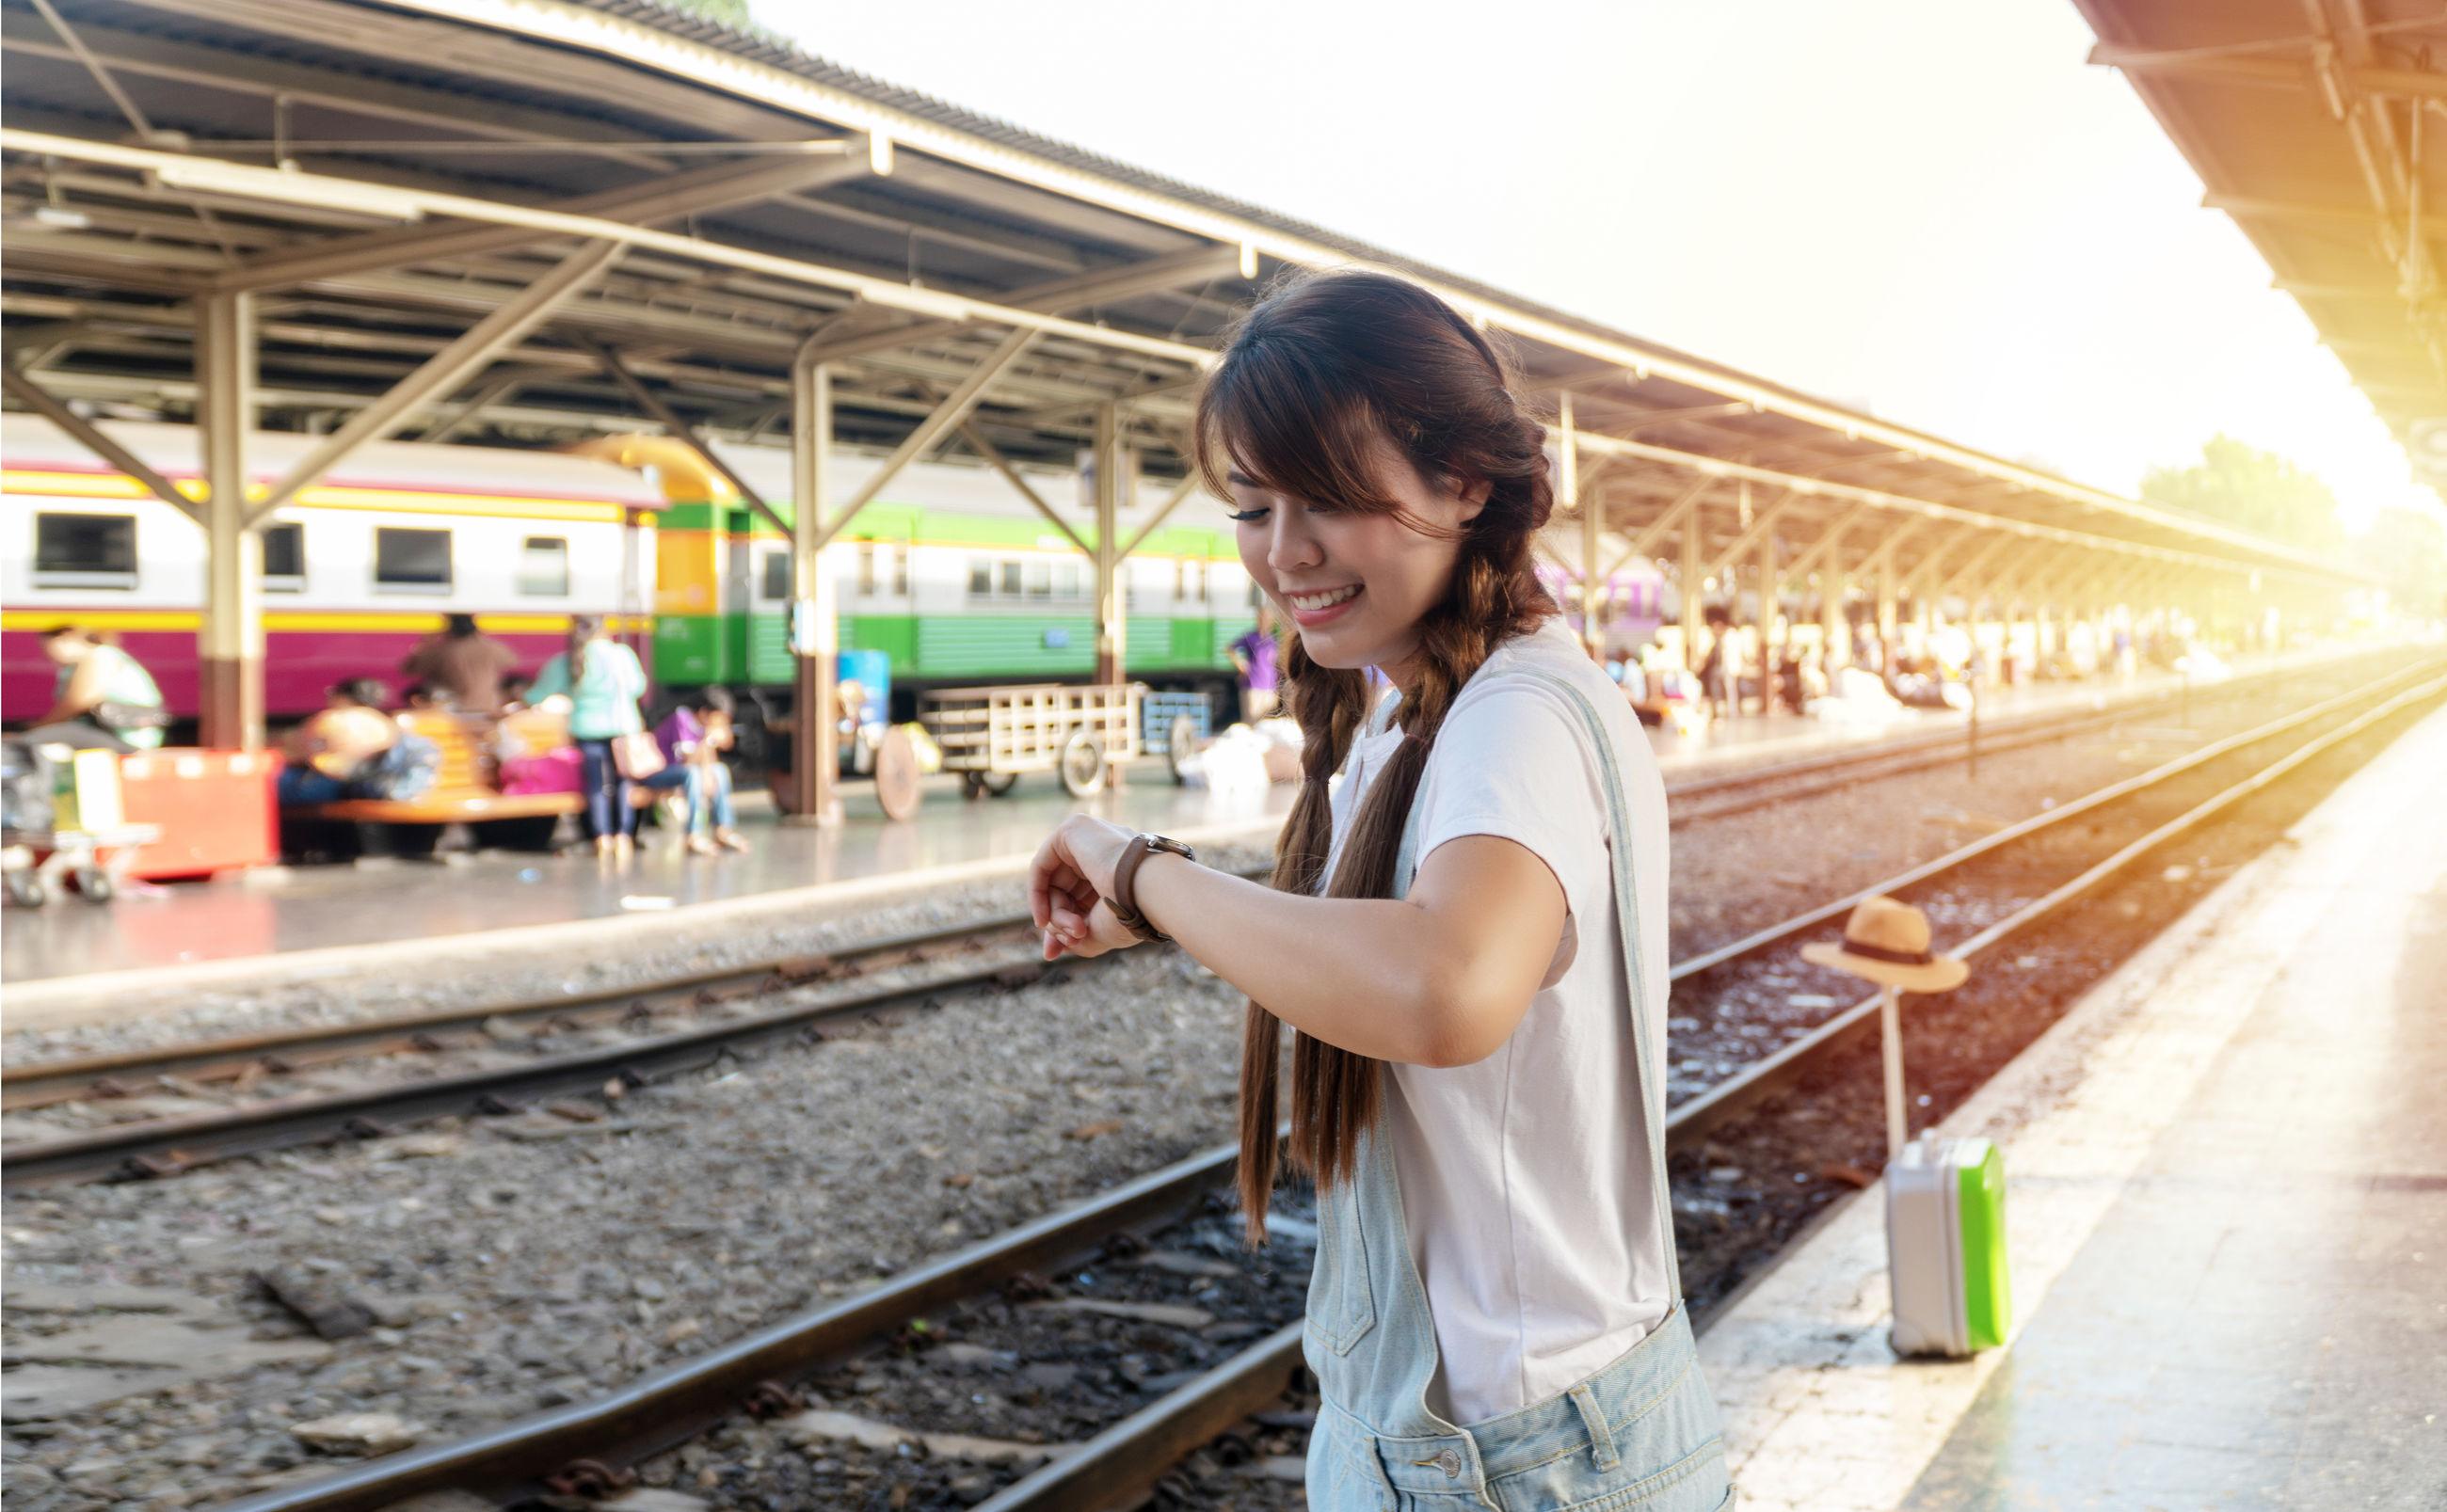 Woman checking time at railroad station platform